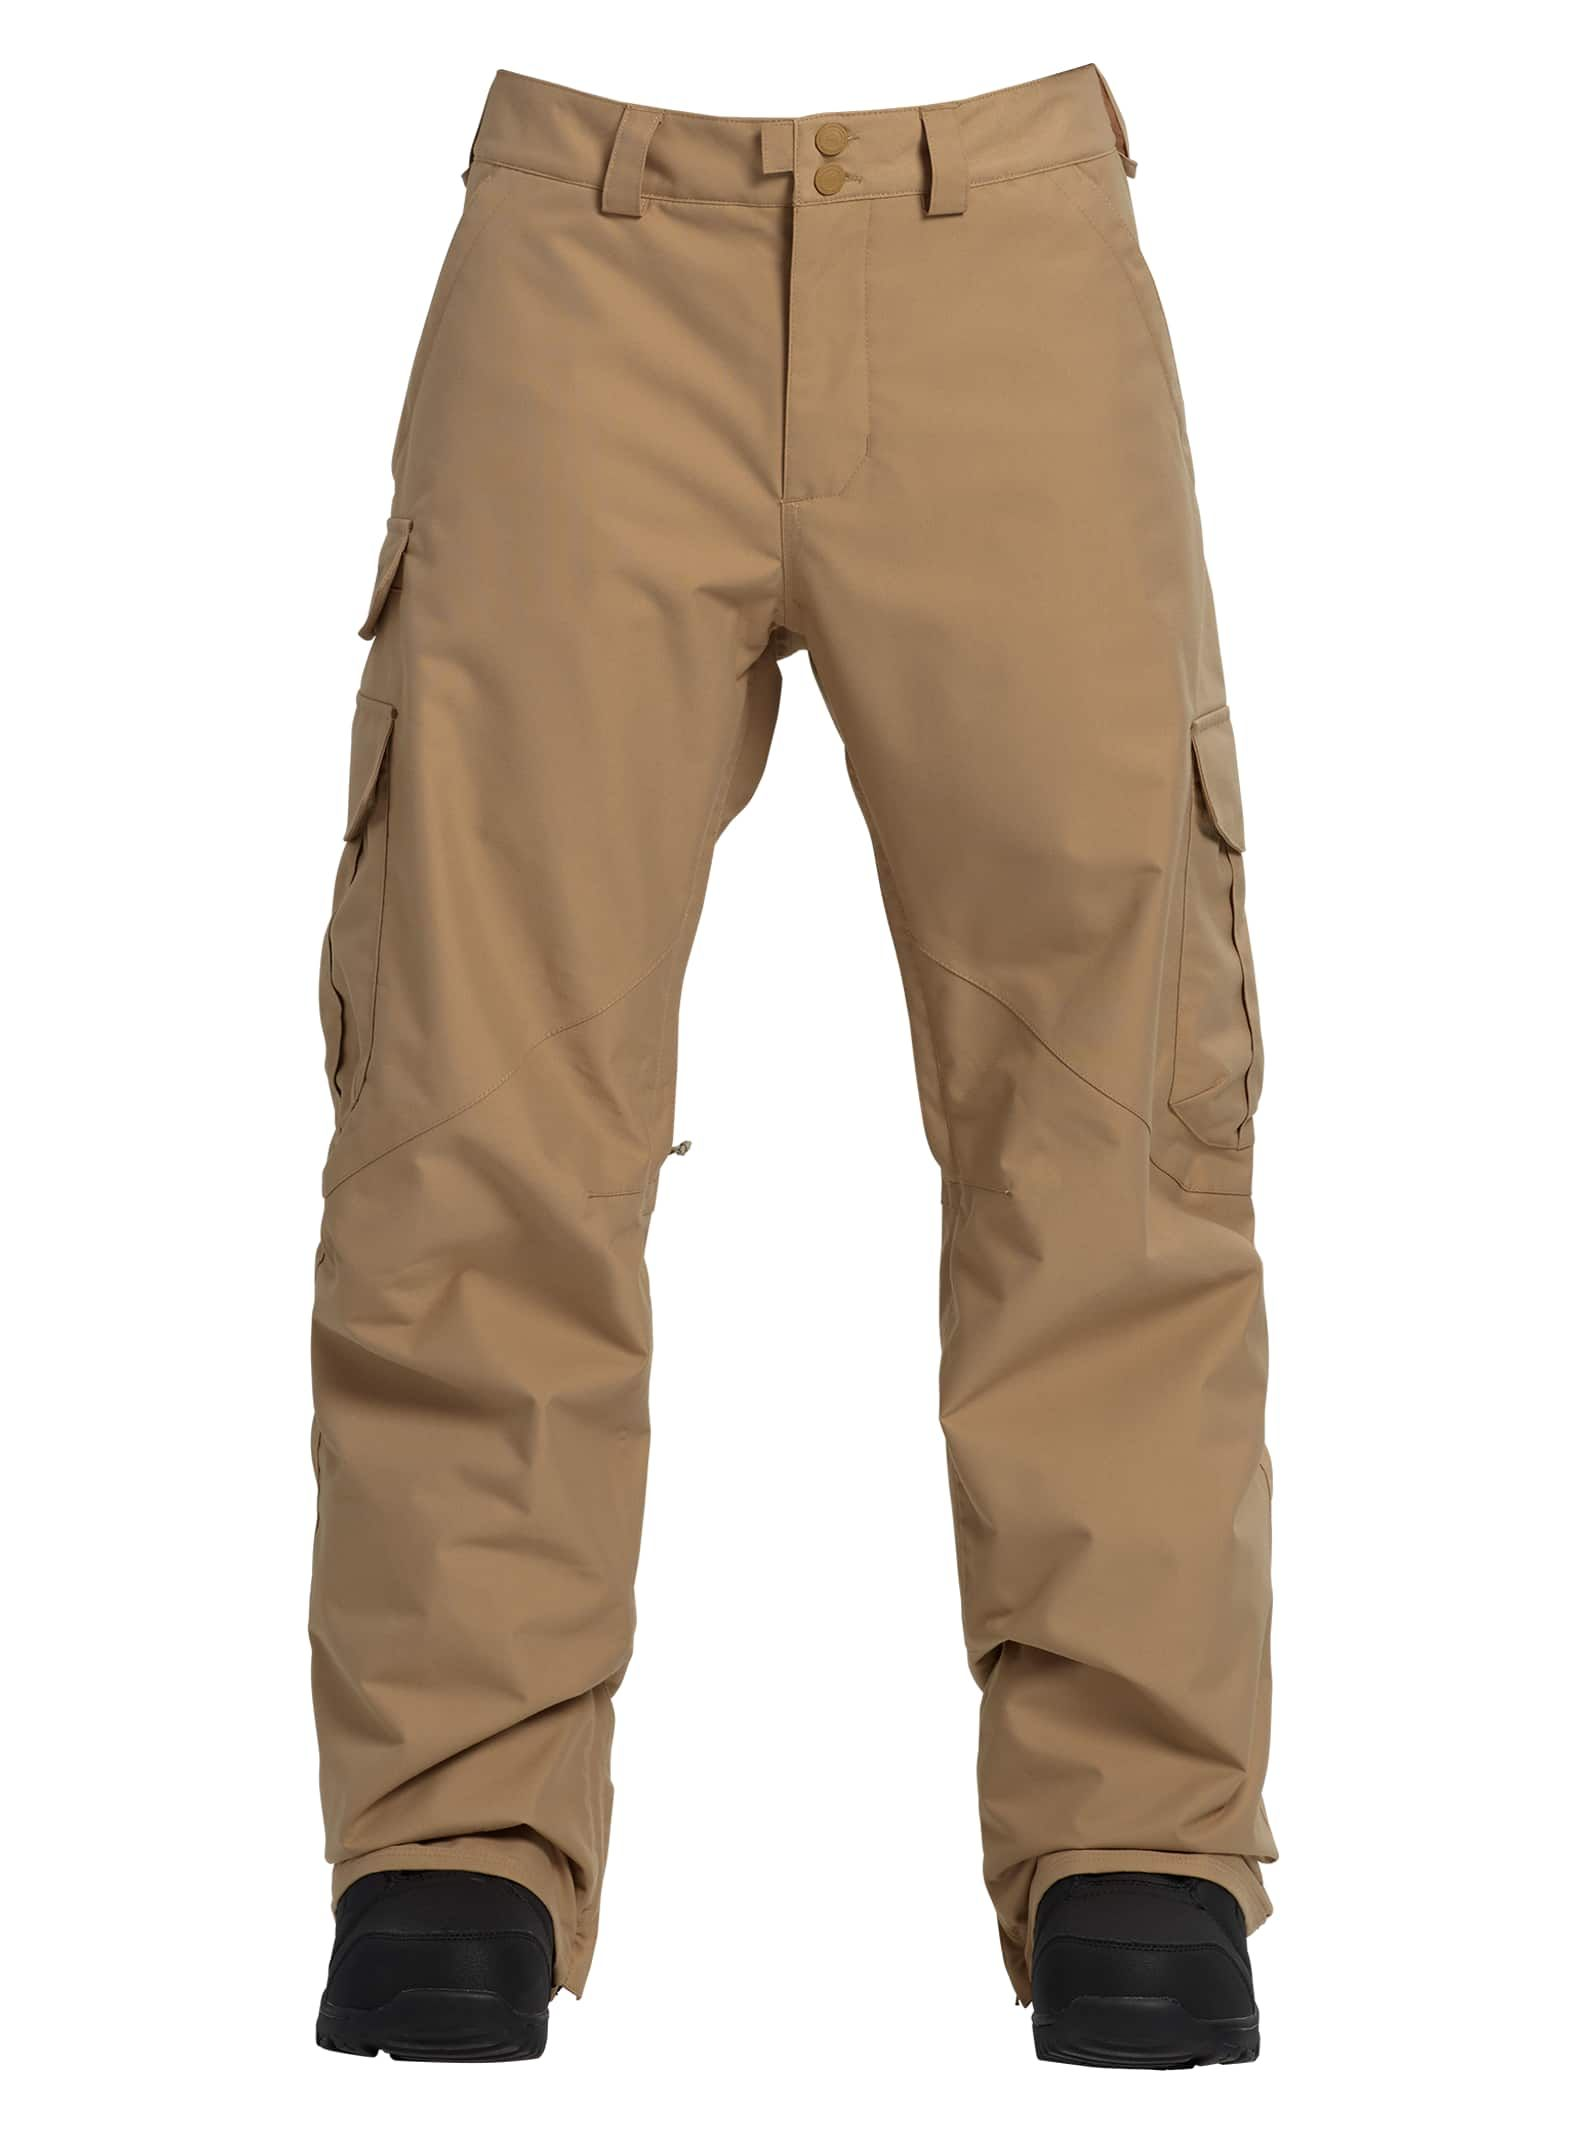 Men's Burton Cargo Pant Regular Fit